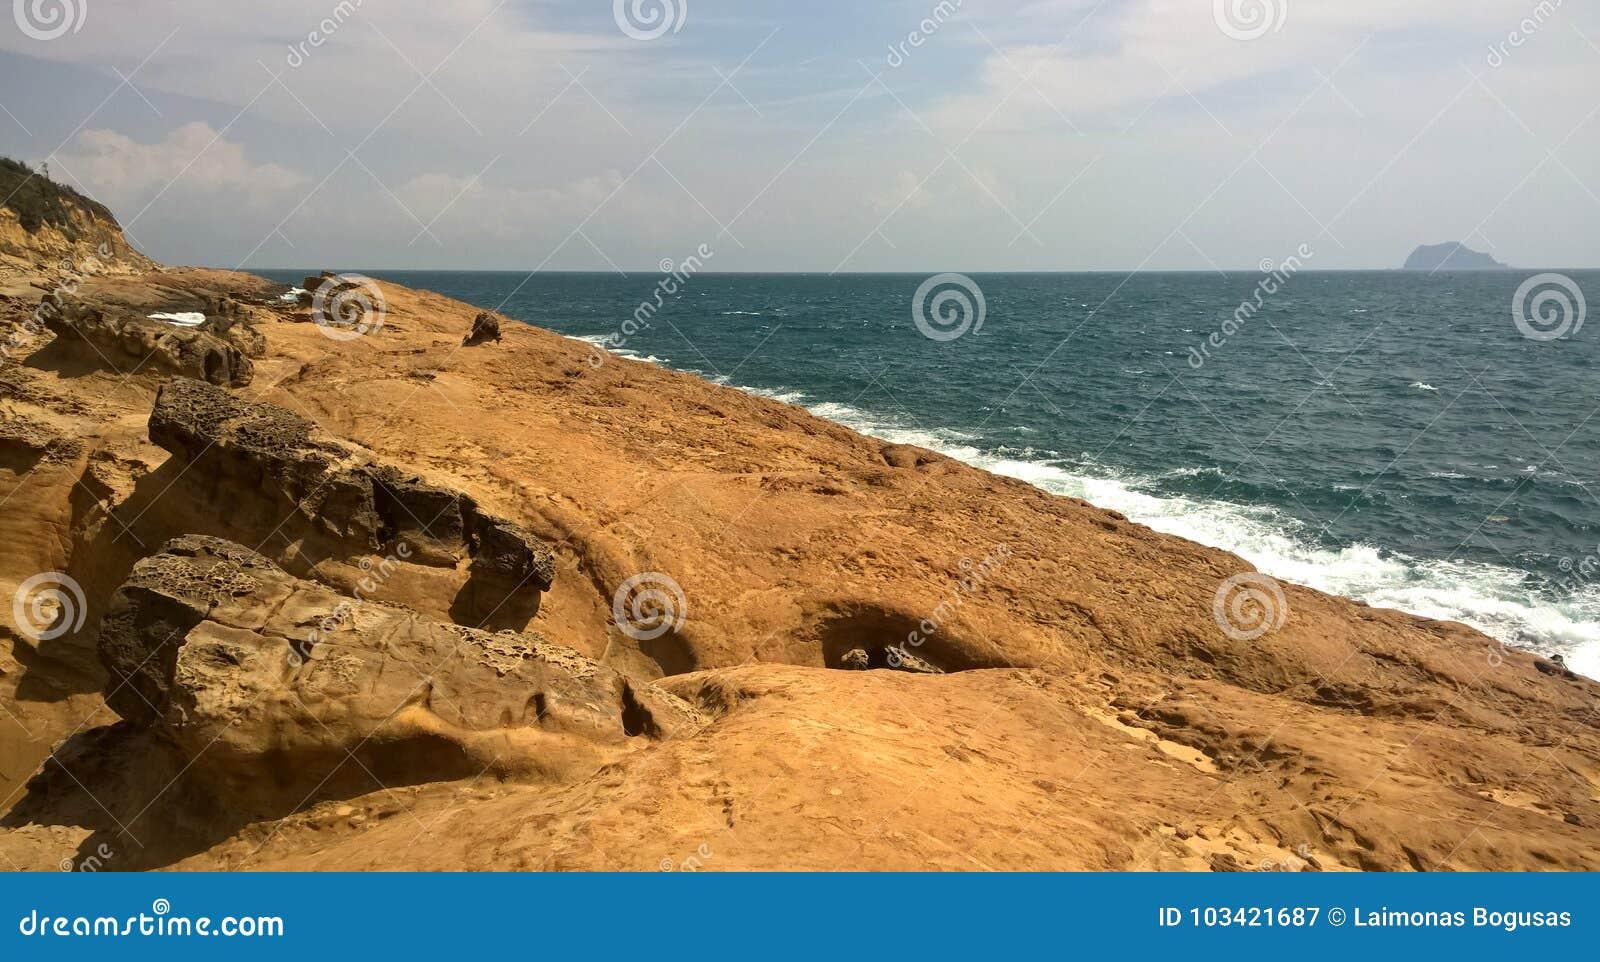 Taiwan. Rocks on the beach